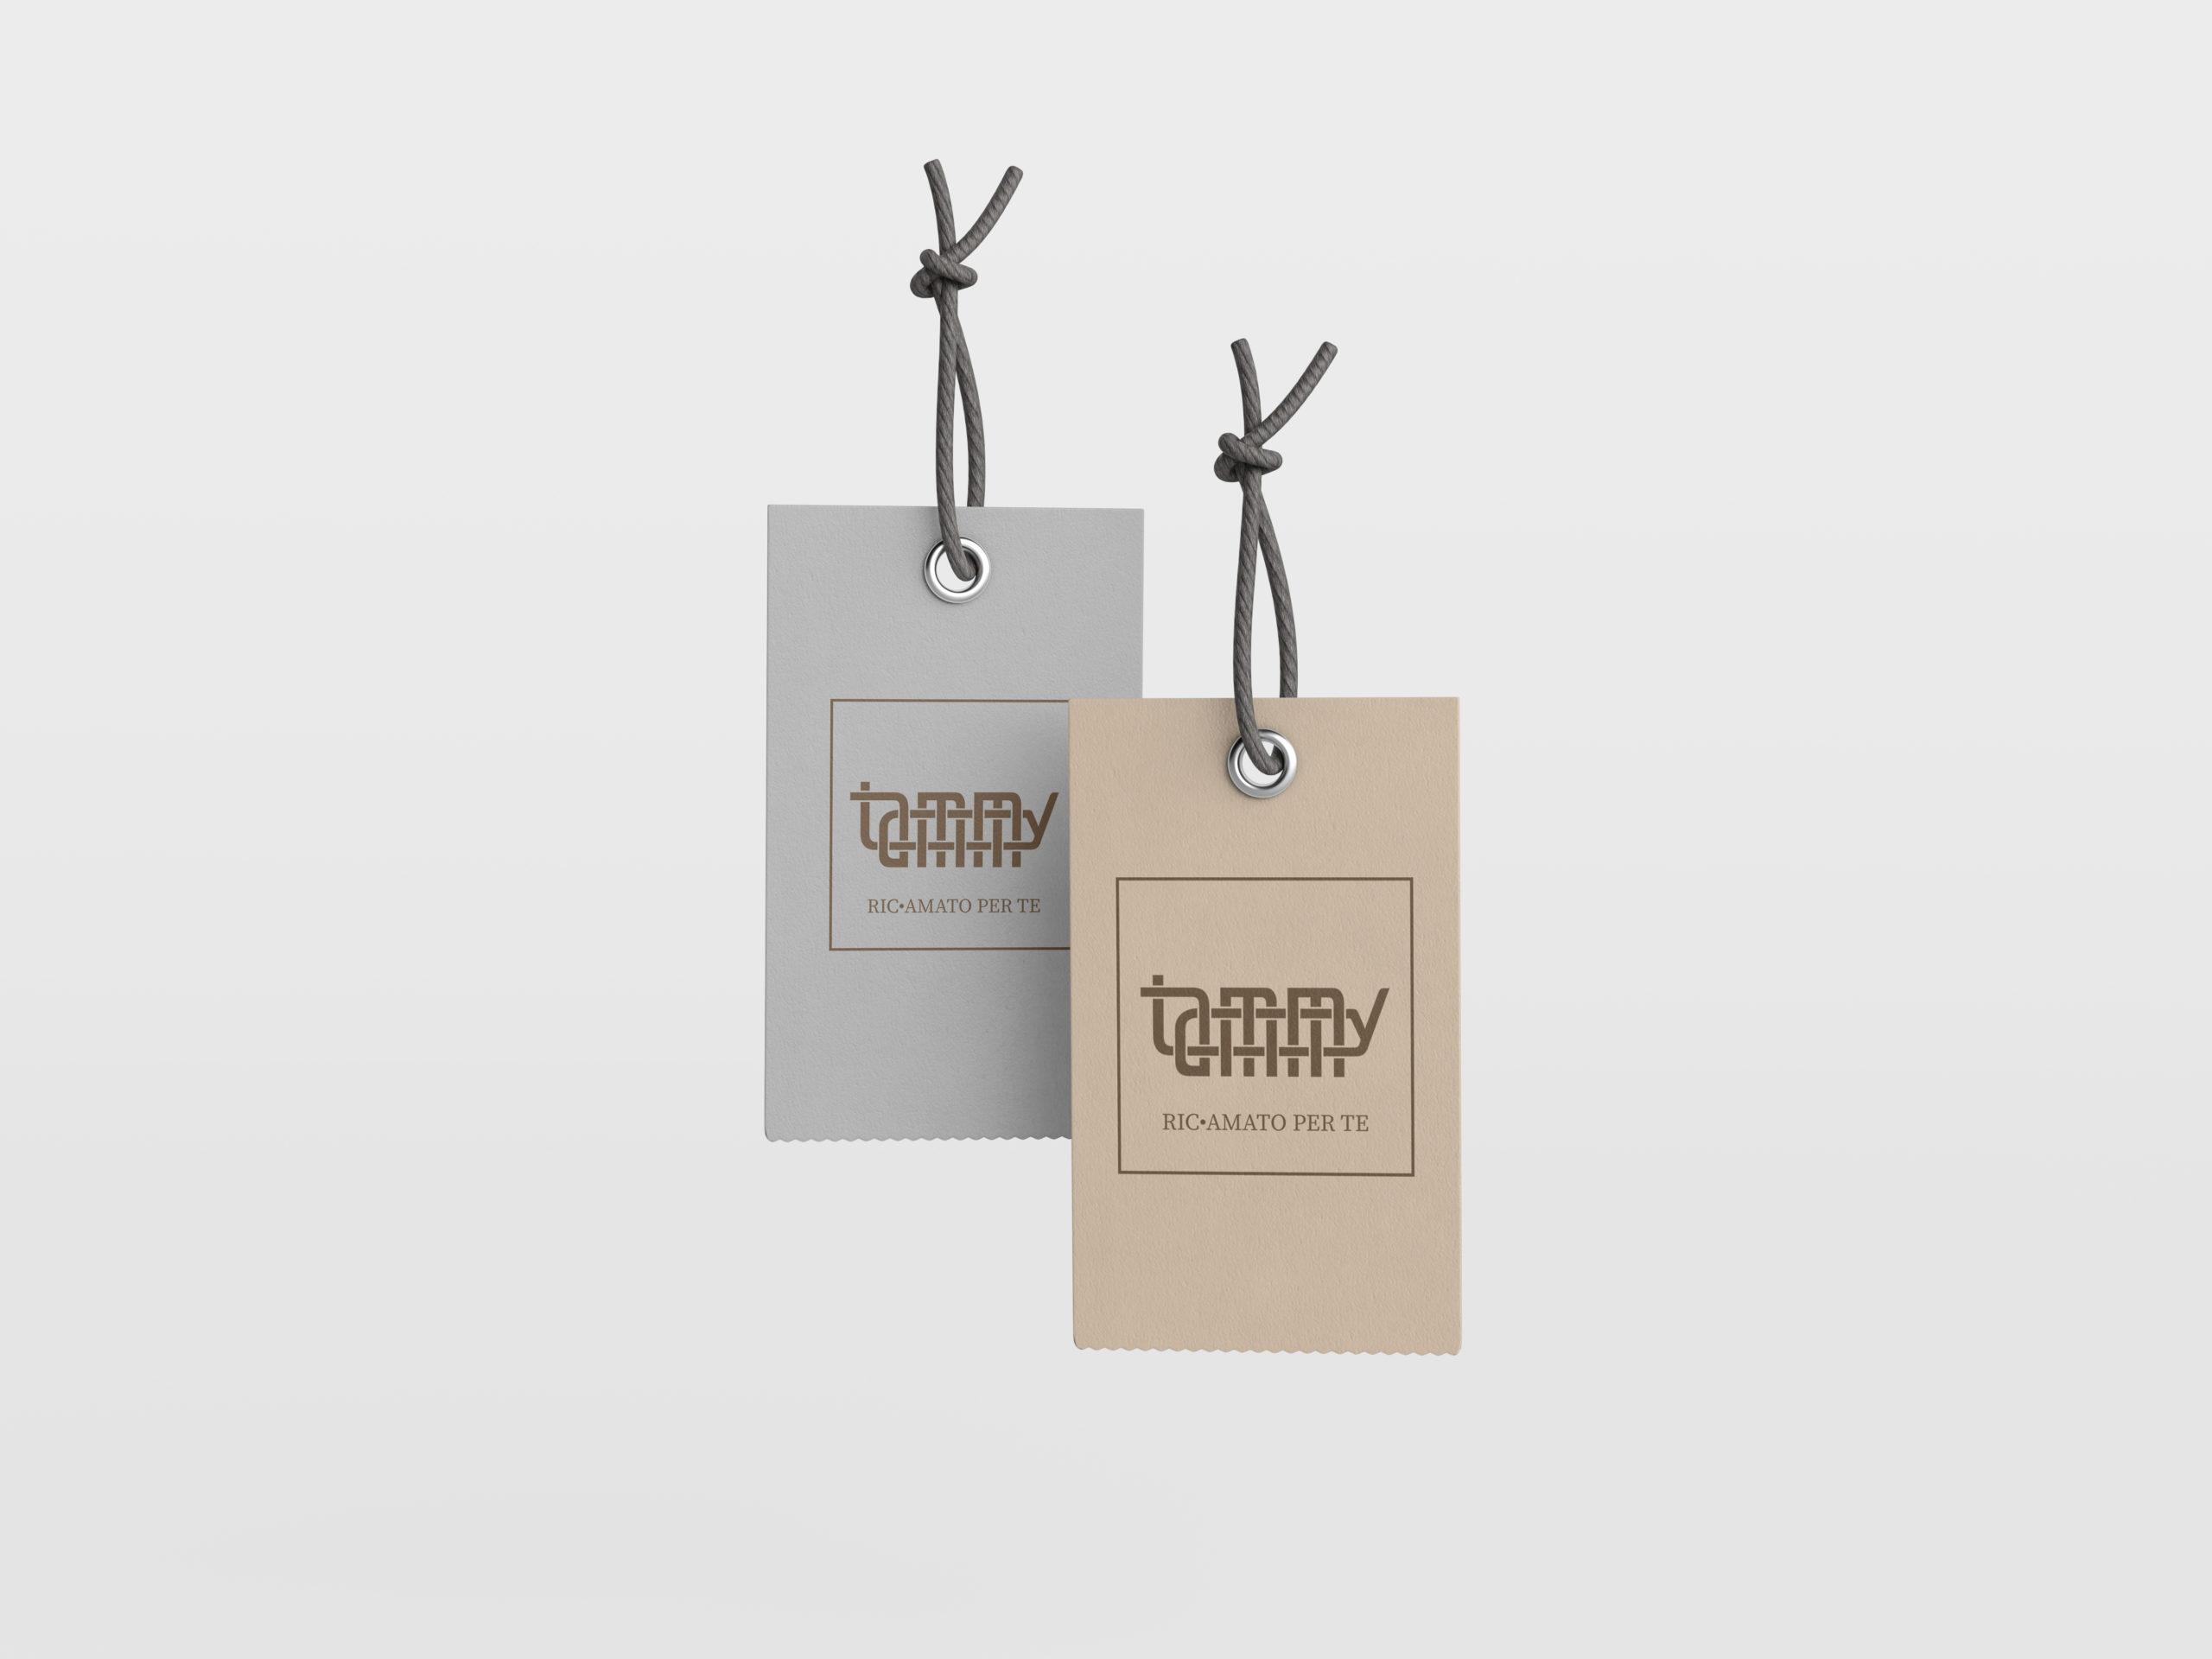 Project work: Logo design Tammy ricami (2)